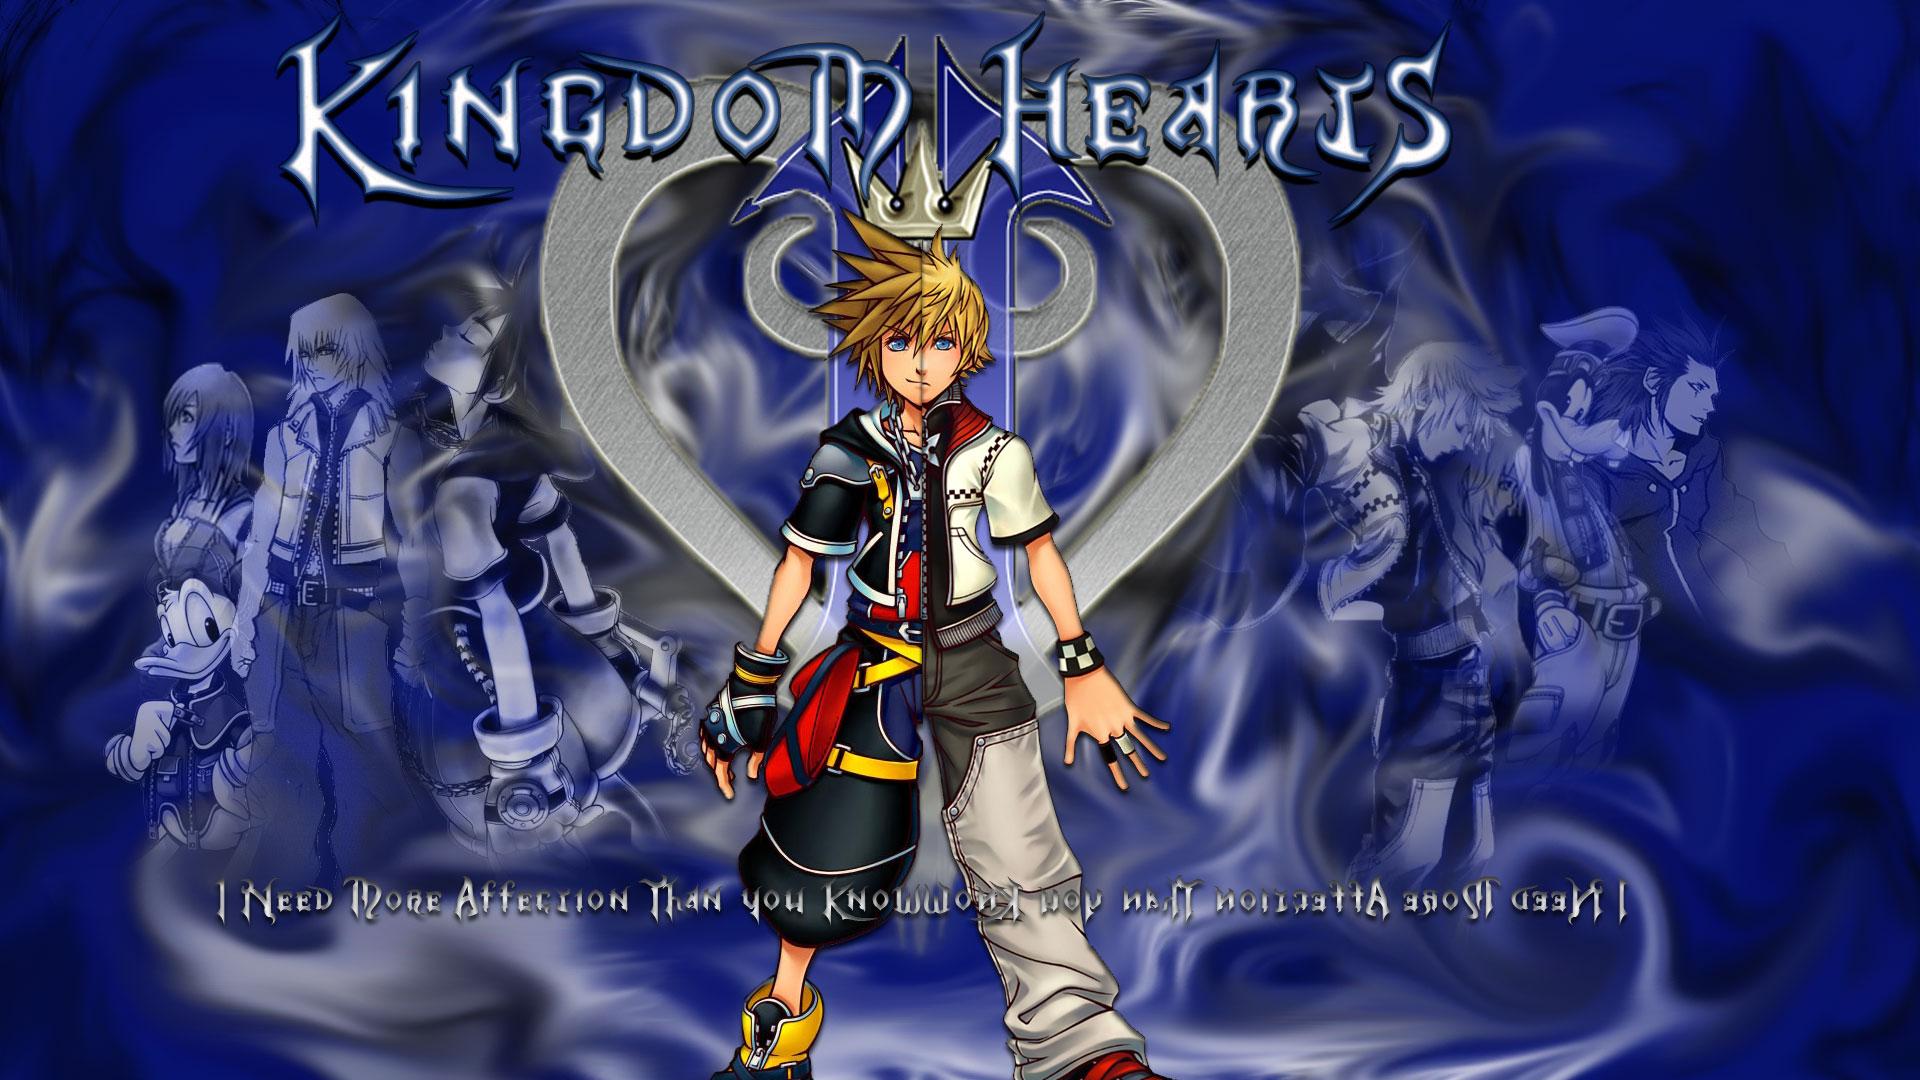 Kingdom Hearts Background wallpaper 145152 1920x1080